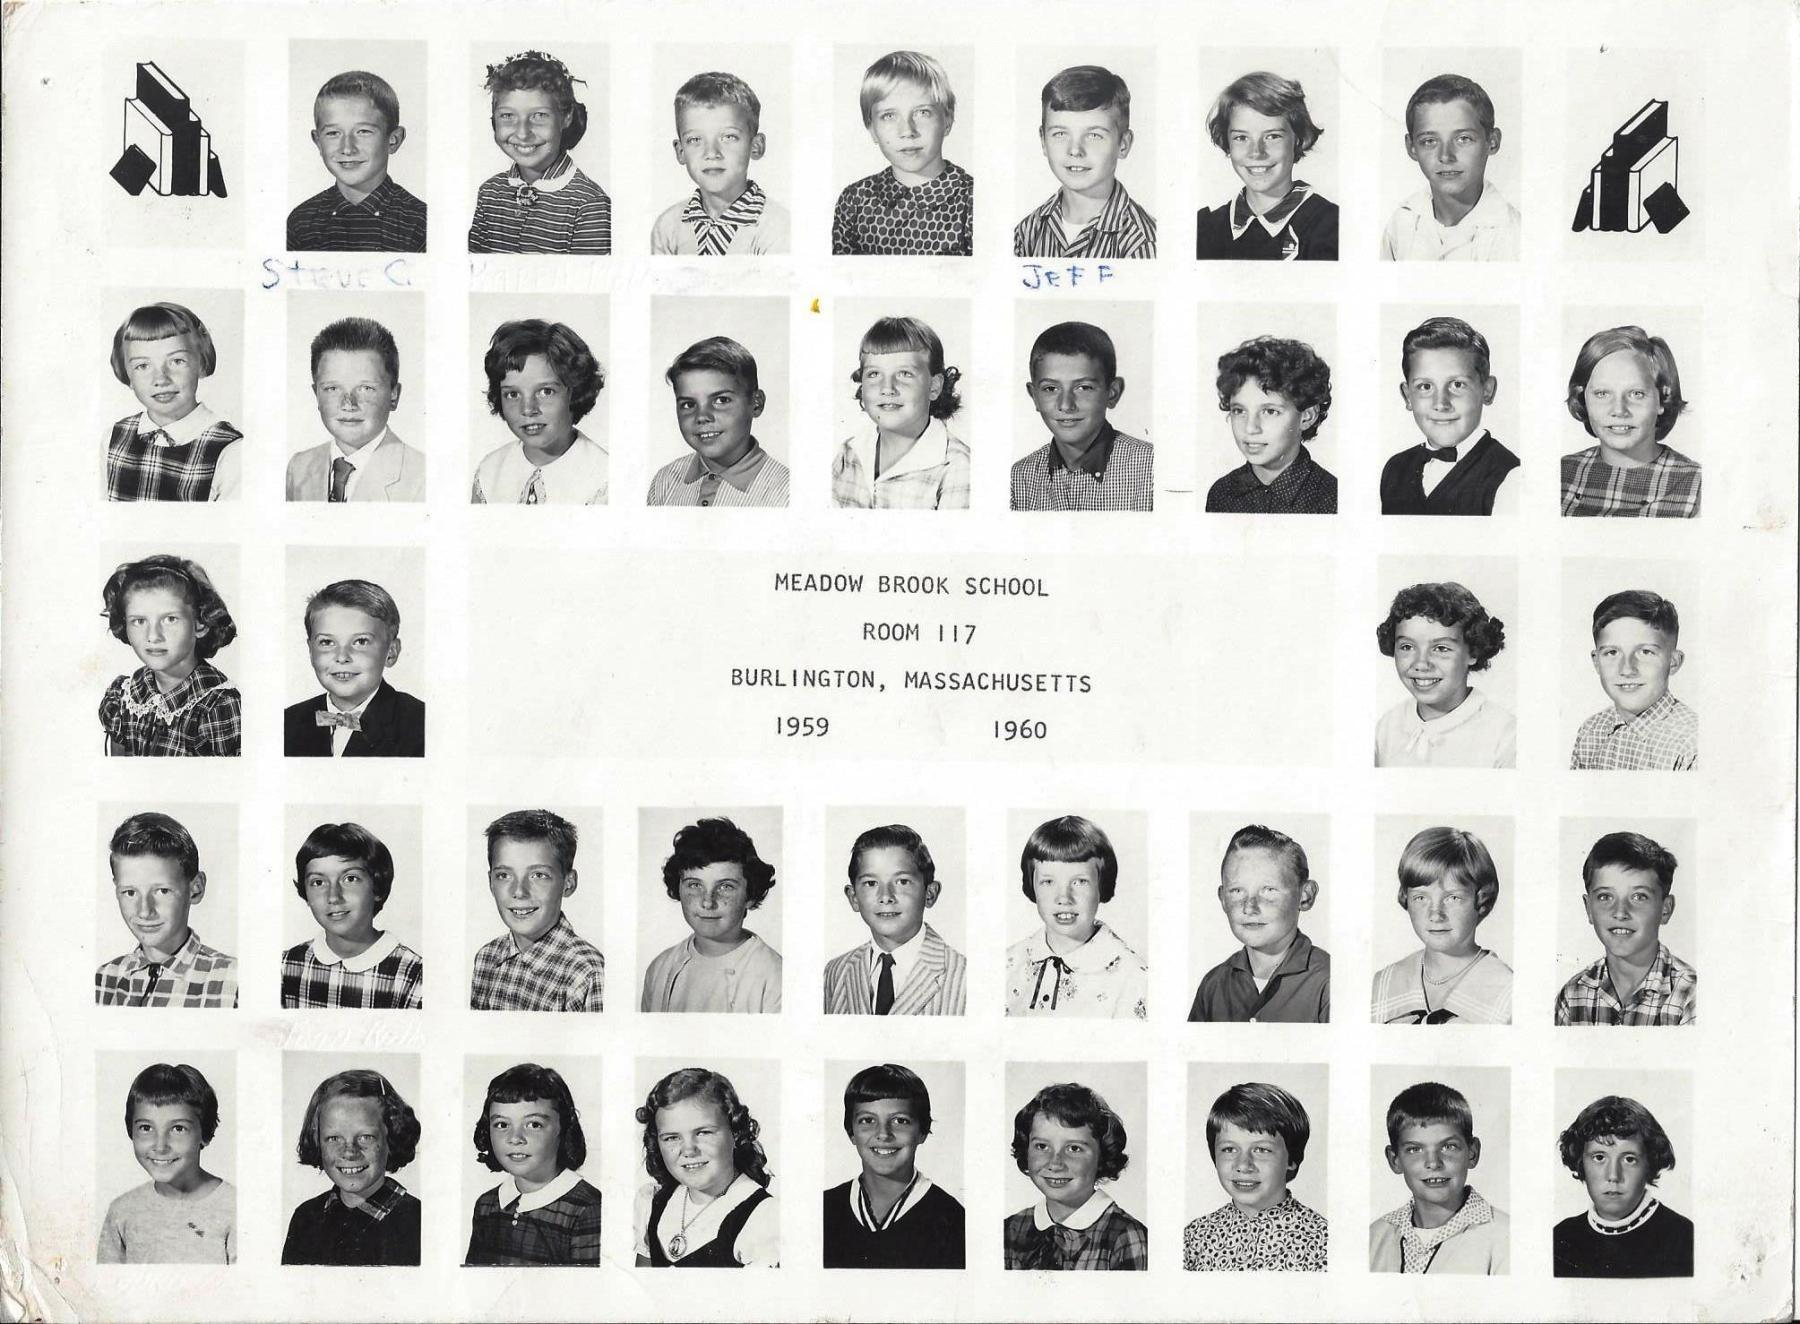 Meadow Brook School Room 117, 1959-1960, Burlington MA